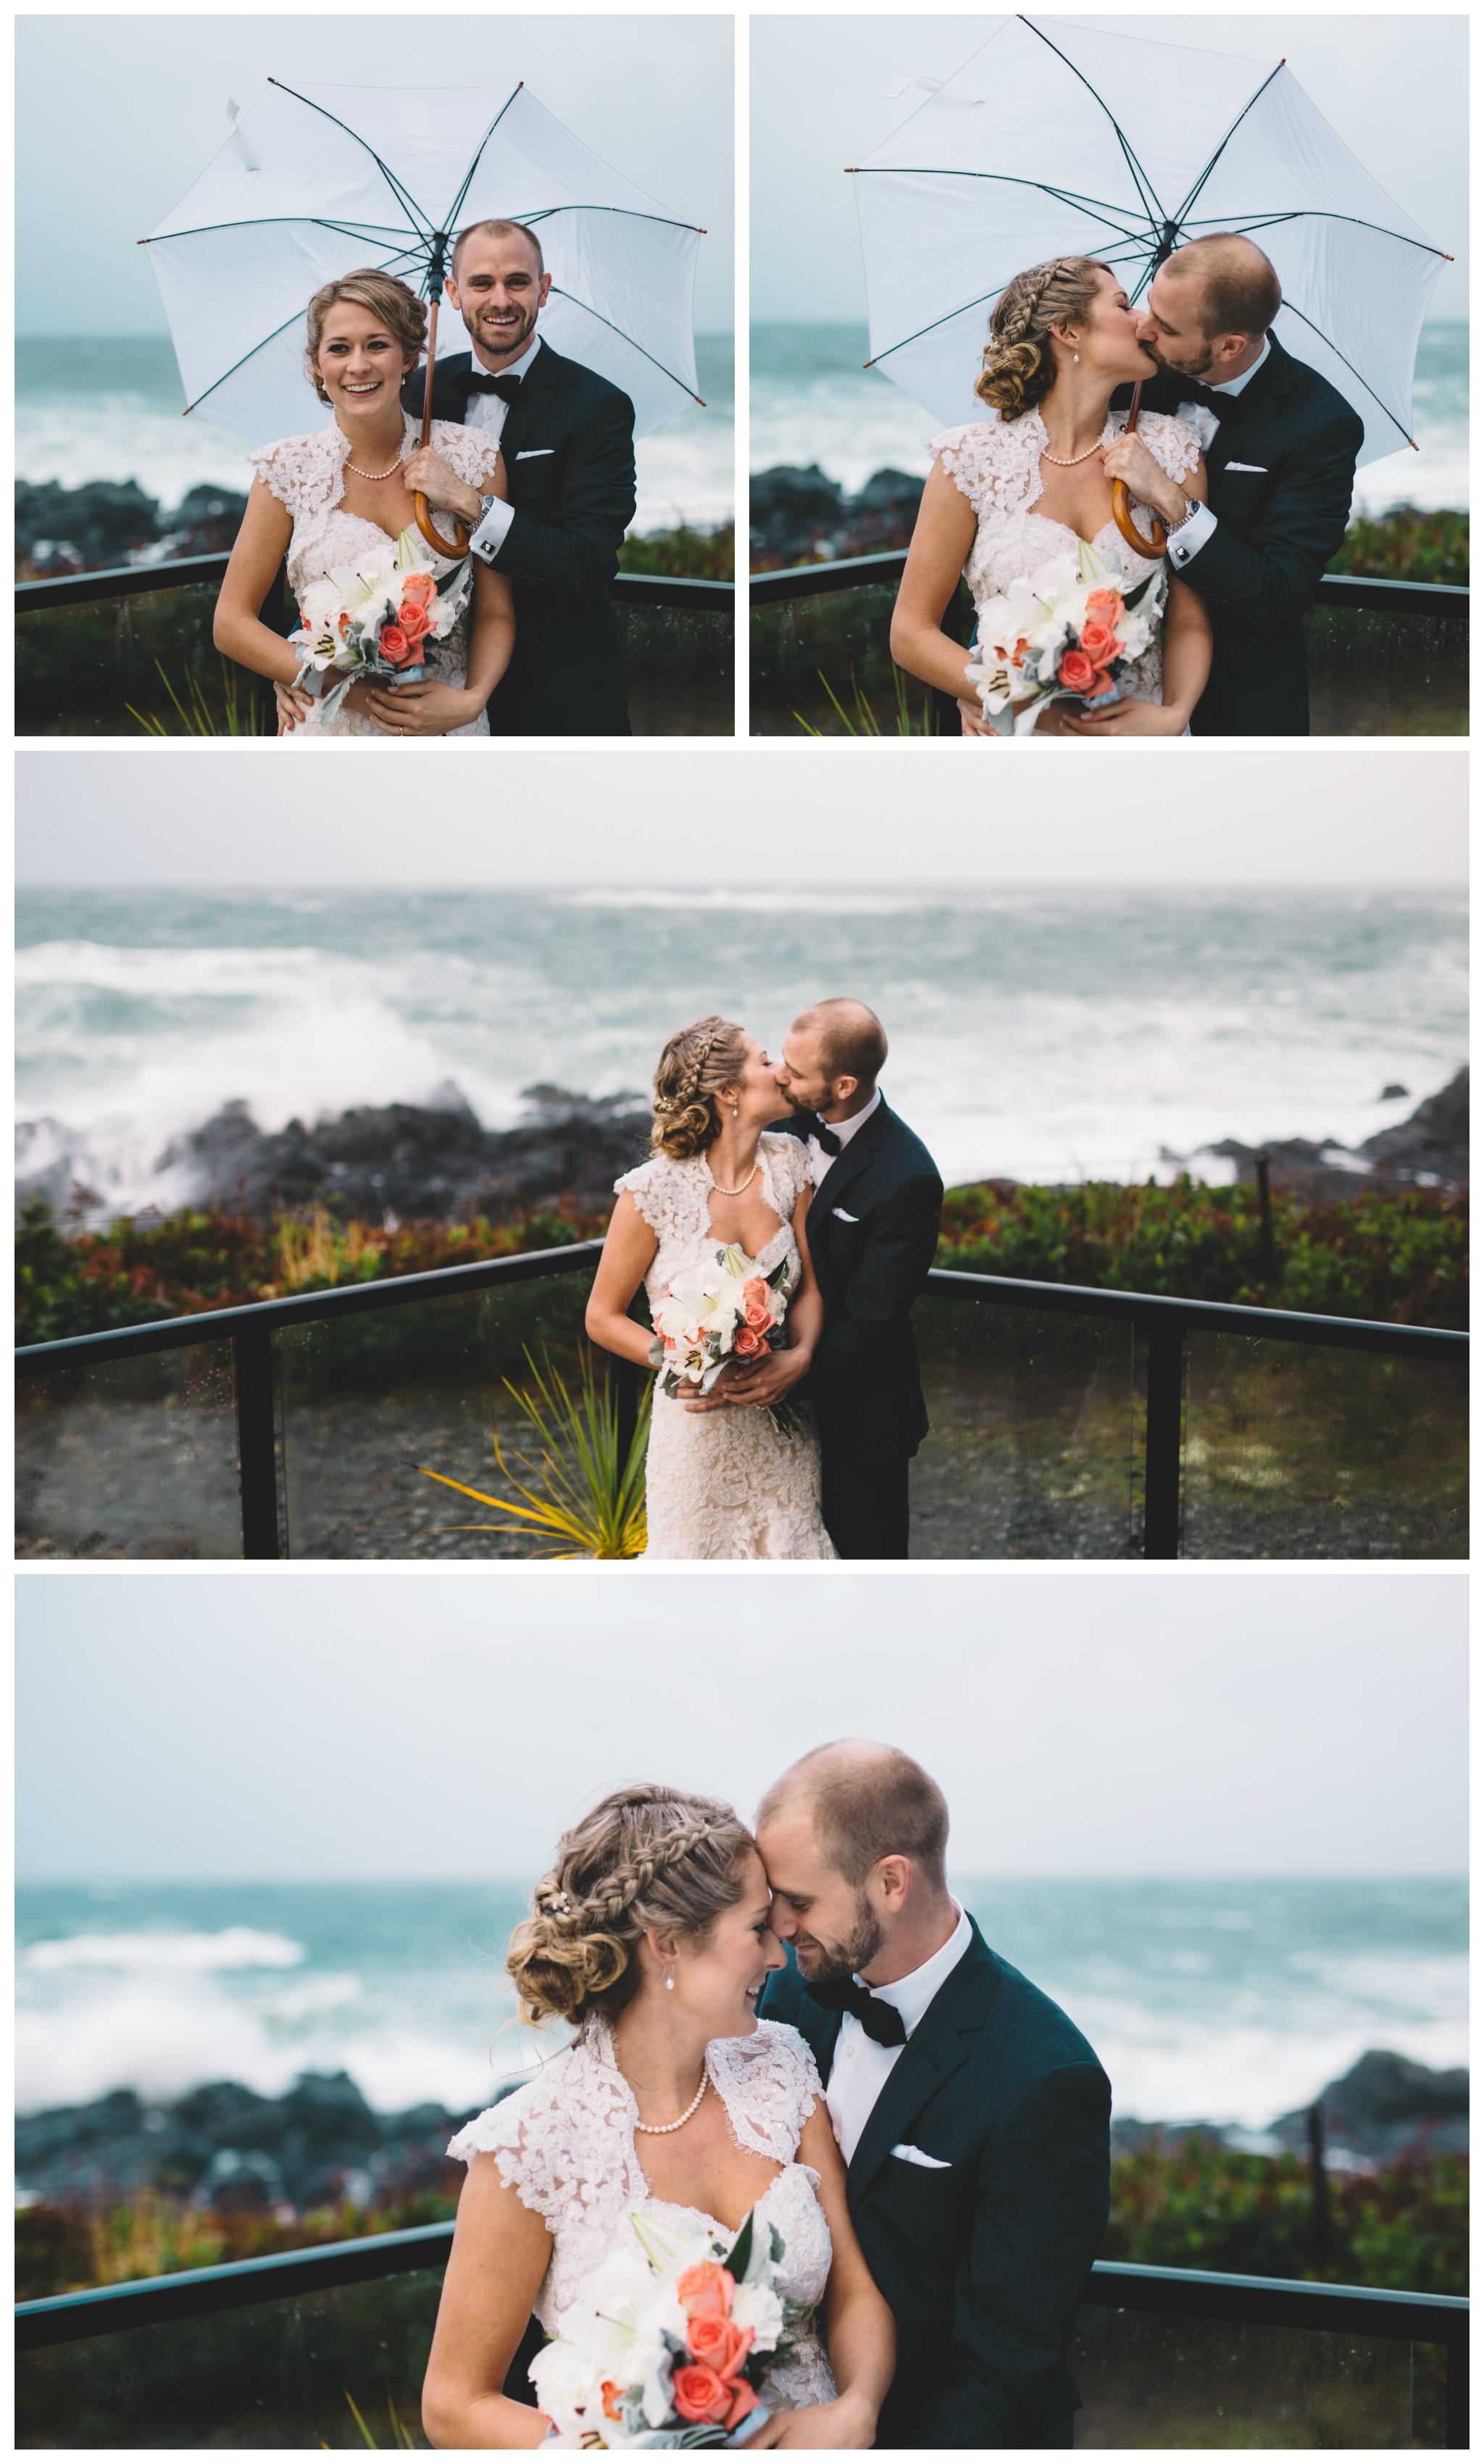 frick-wedding-14.jpg